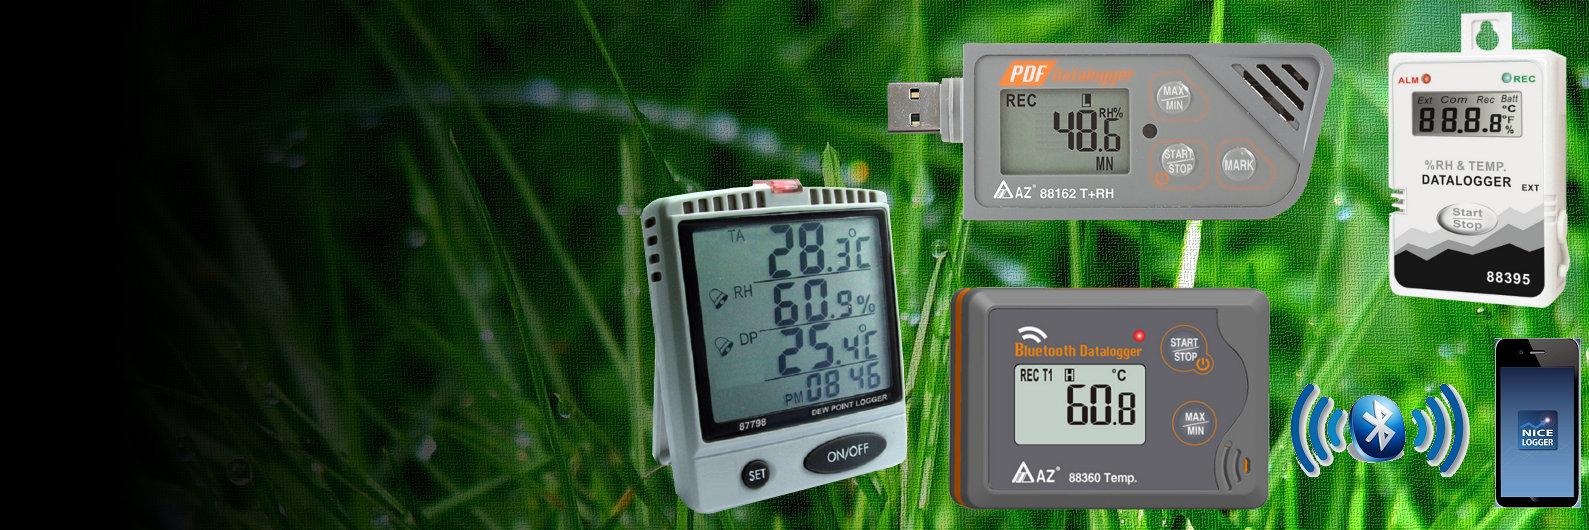 Inregistratoare de temperatura si umiditate Bluetooth Serial USB PDF birouri muzeu HVAC transport produse medicale